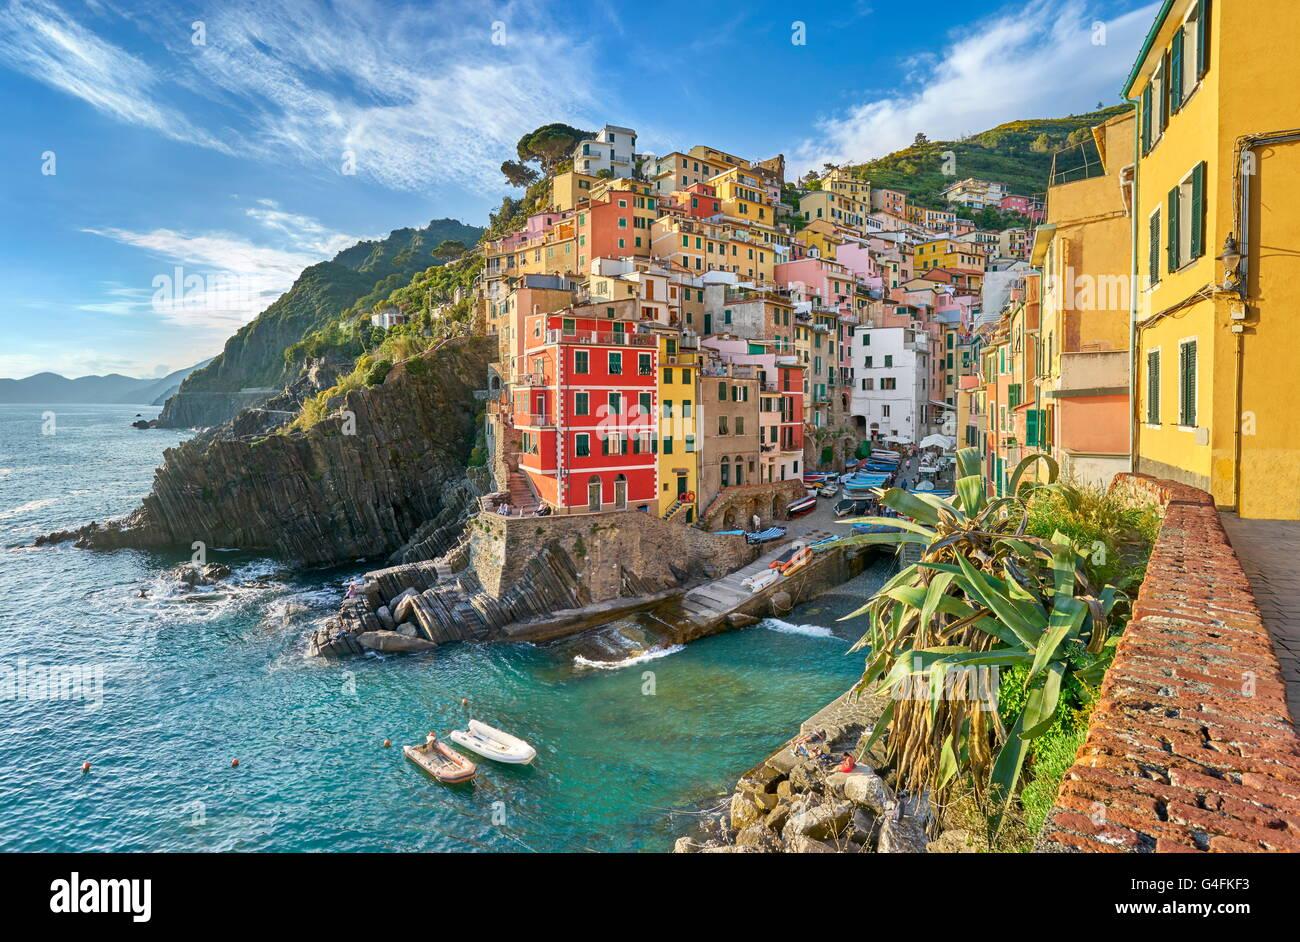 Riomaggiore, Cinque Terre National Park, Liguria, Italy, UNESCO - Stock Image